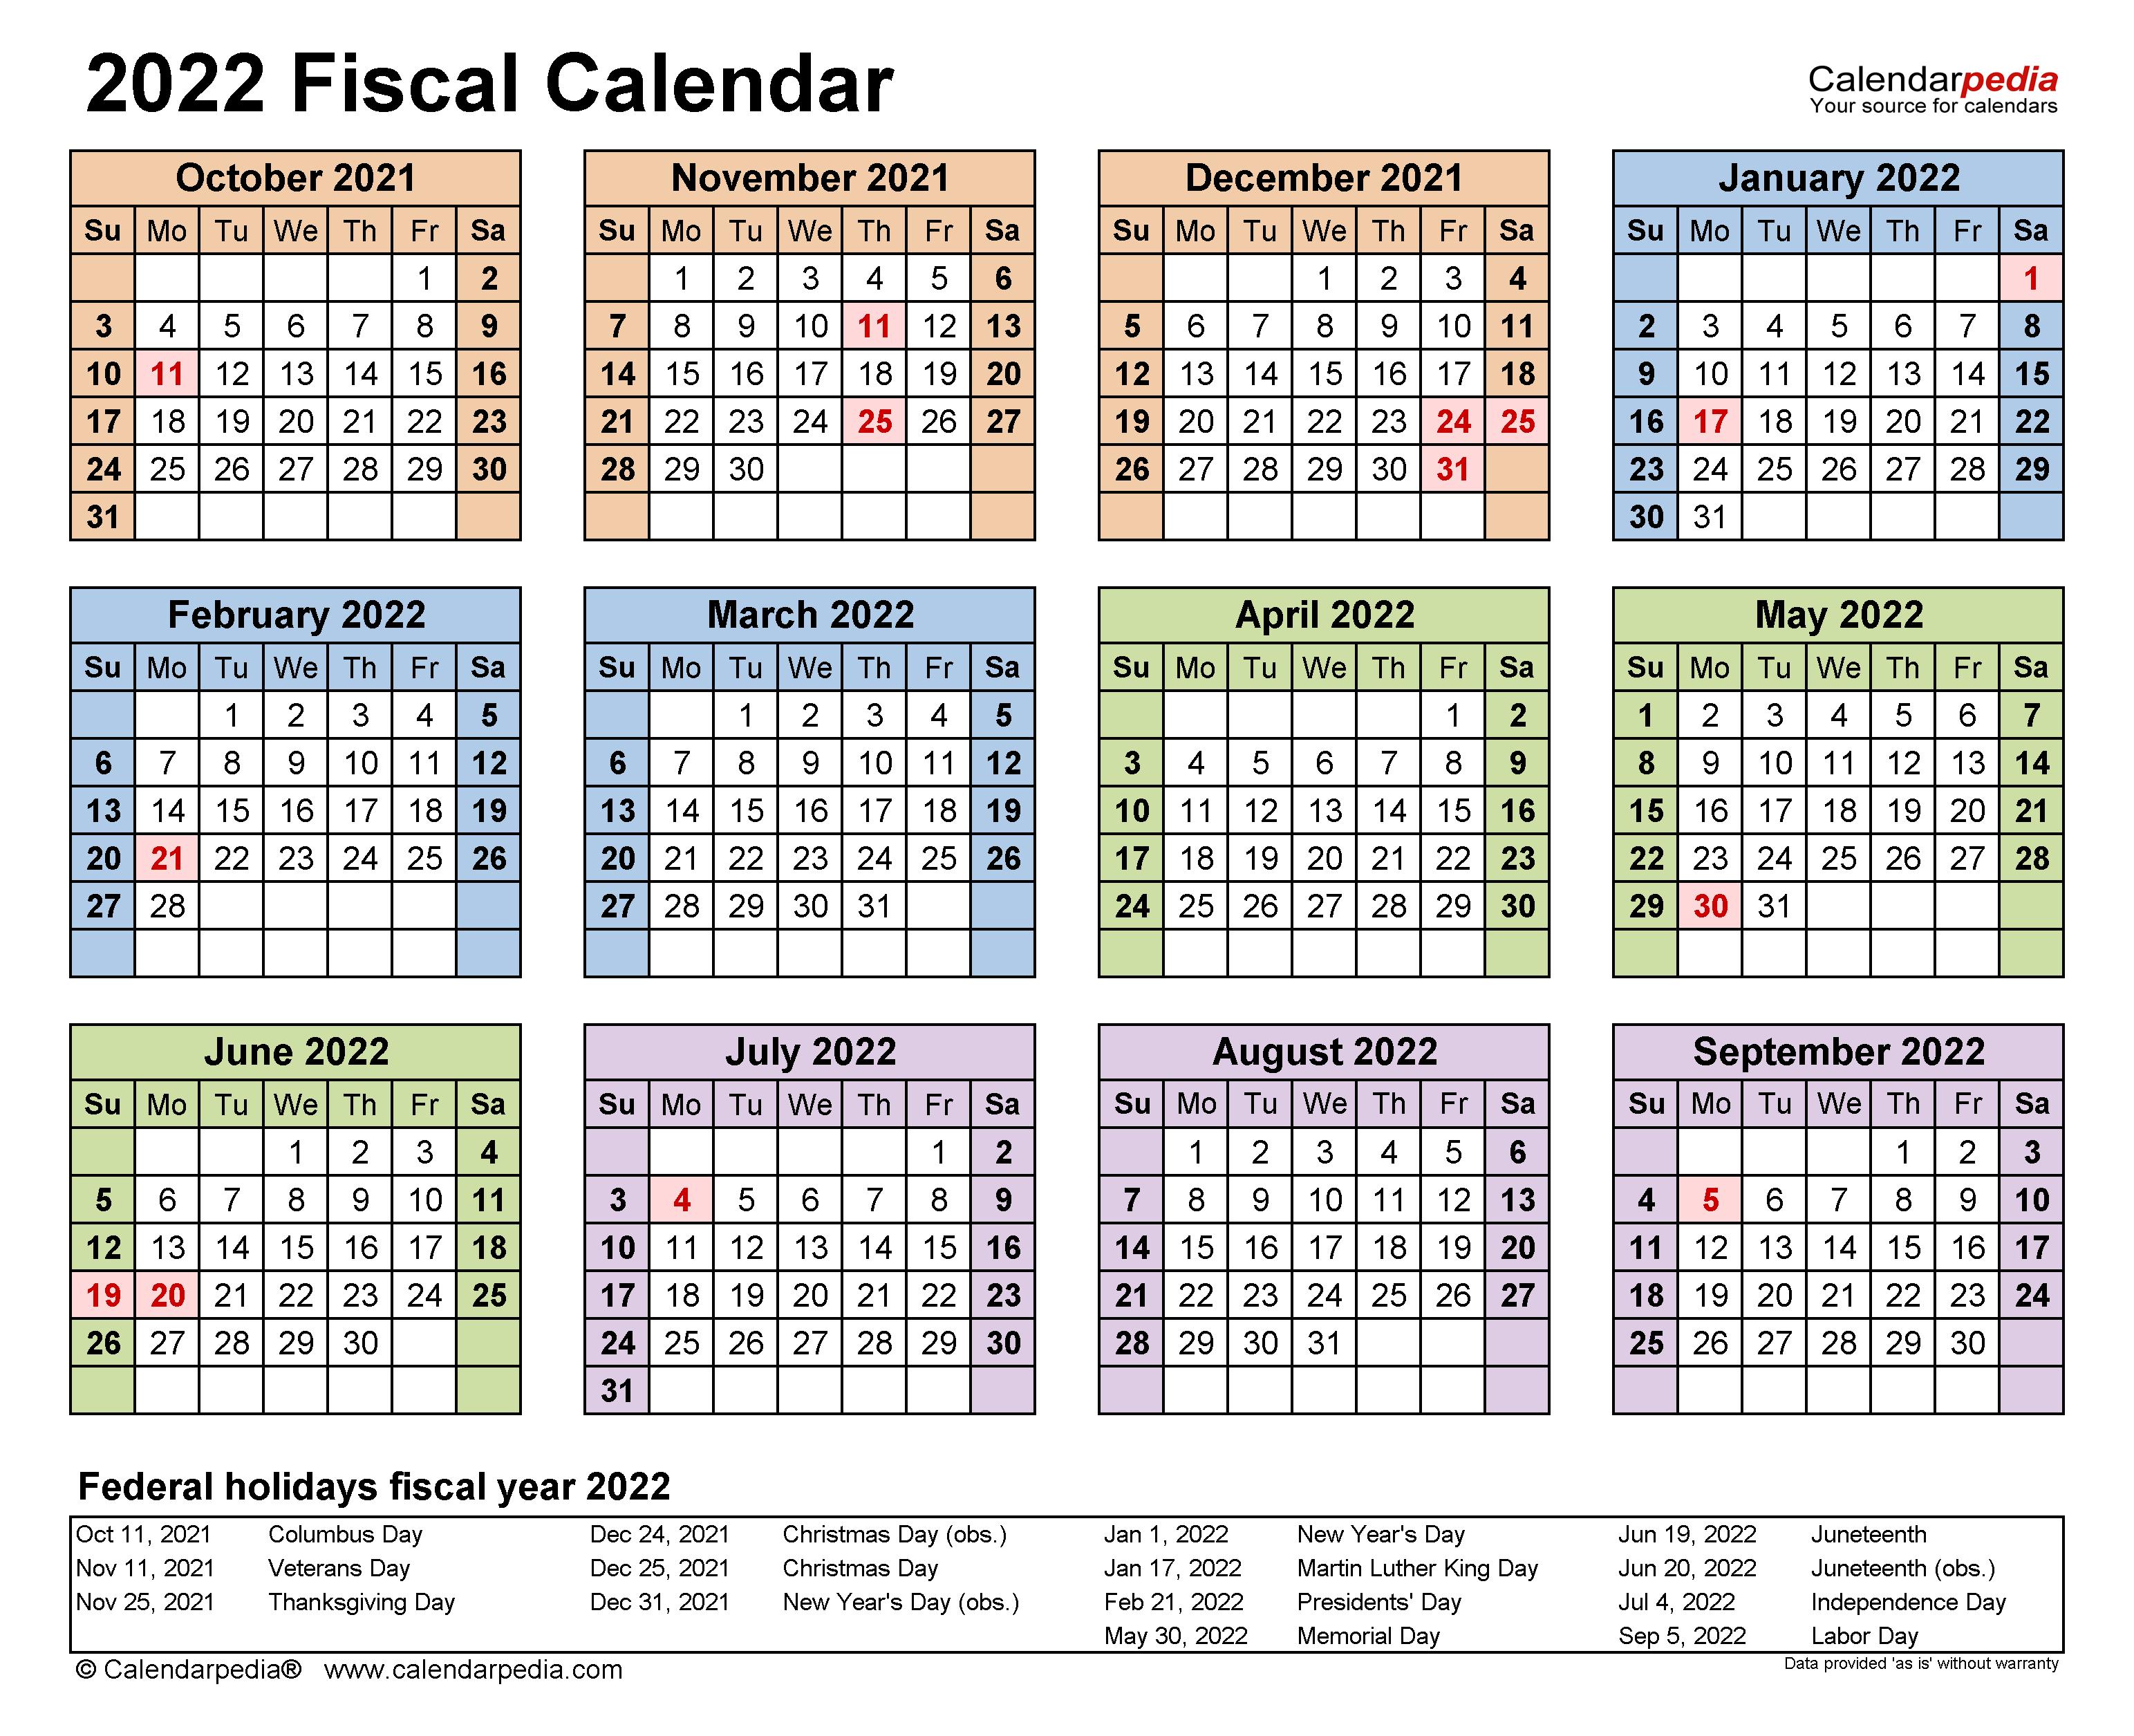 Calendrier Federale 3 2022 2023 Fiscal Calendars 2022   free printable PDF templates